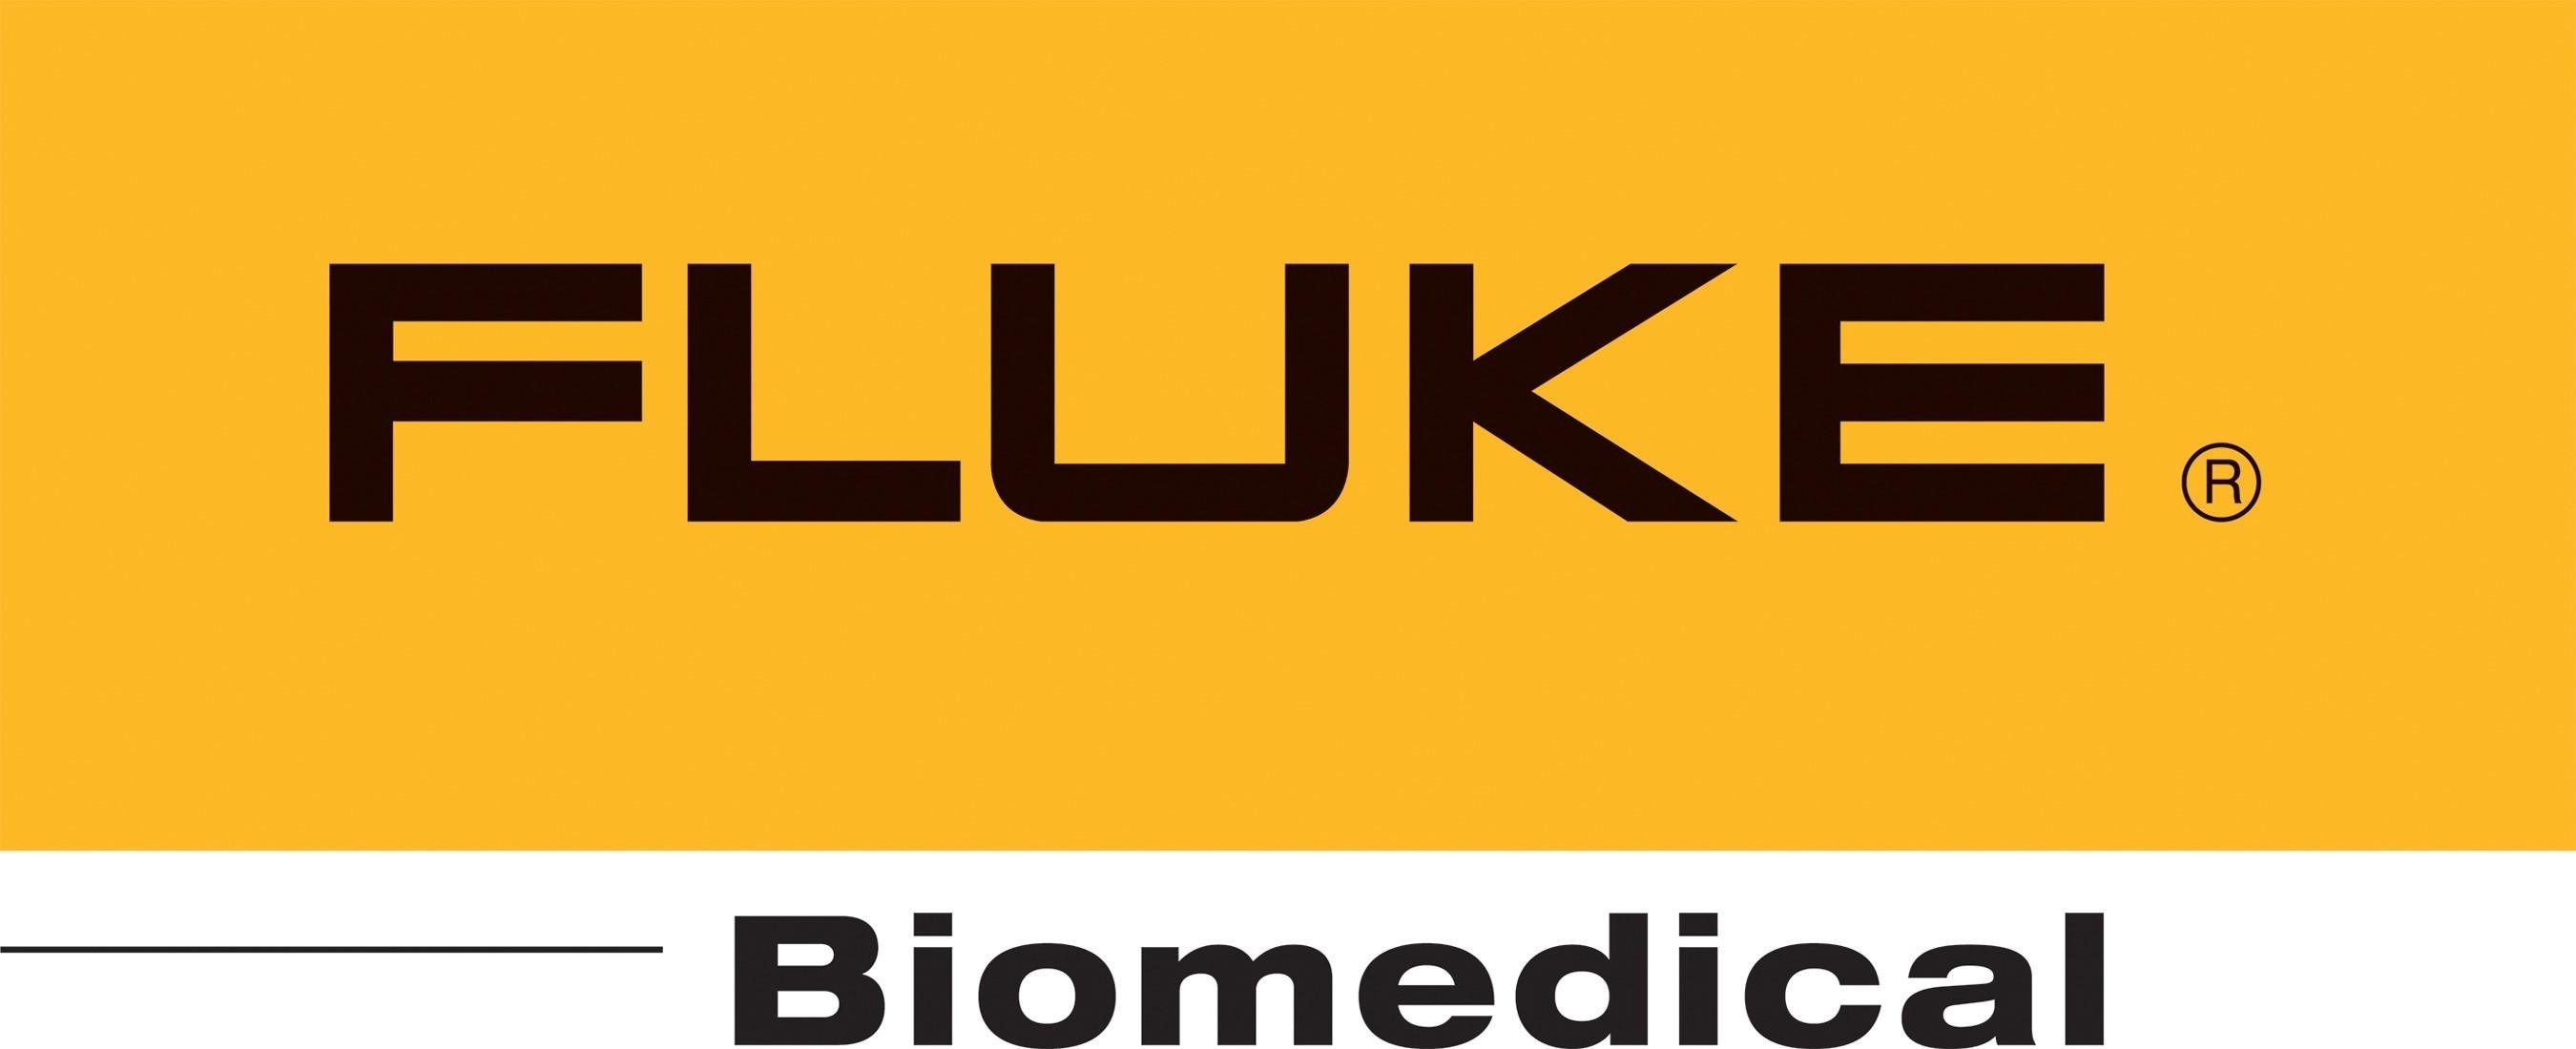 Fluke Biomedical. (PRNewsFoto/Fluke Biomedical) (PRNewsFoto/Fluke Biomedical) (PRNewsFoto/Fluke Biomedical) (PRNewsFoto/Fluke Biomedical)